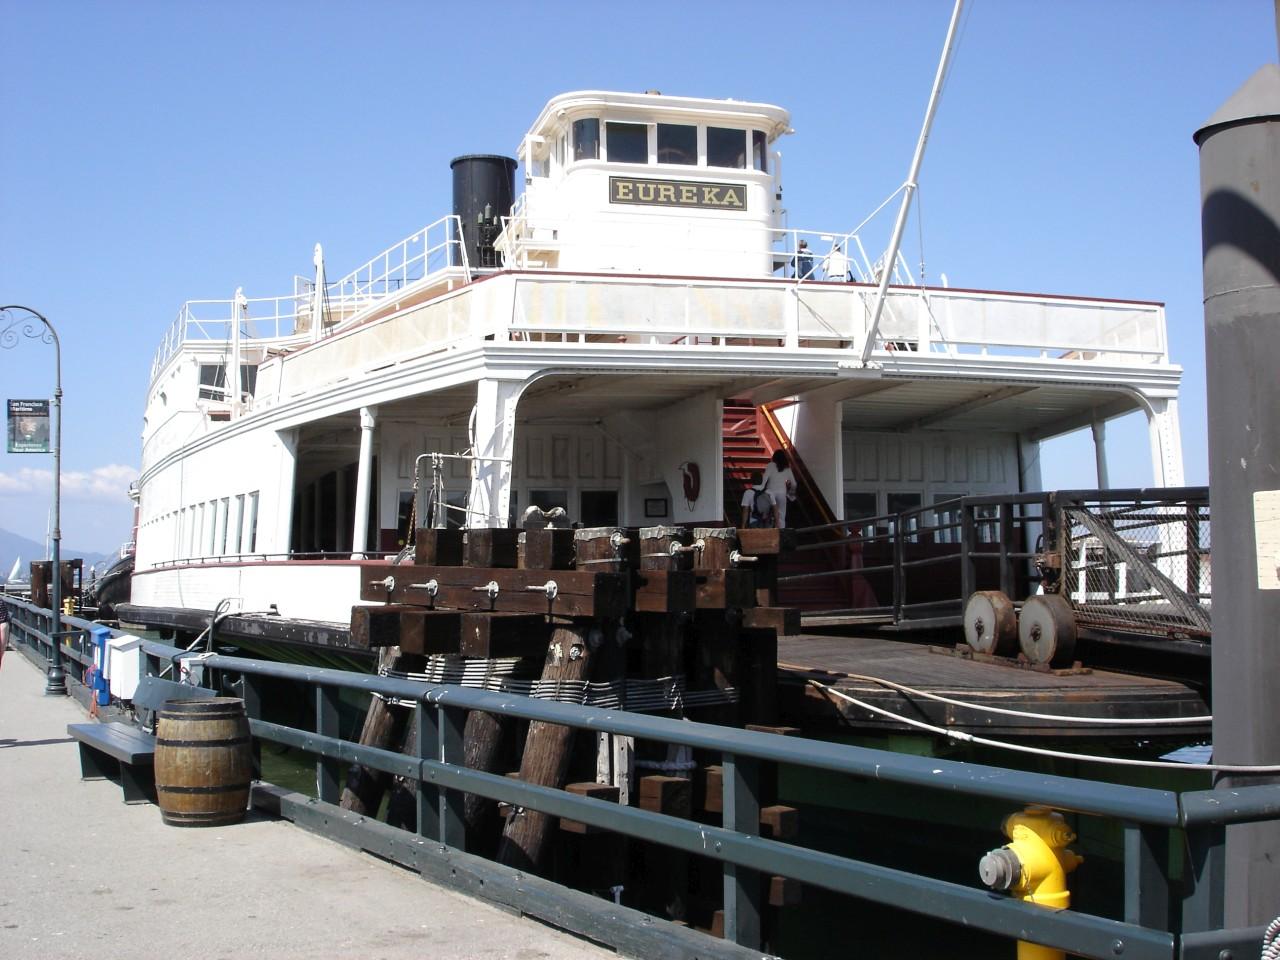 2_eureka_ferry.jpg